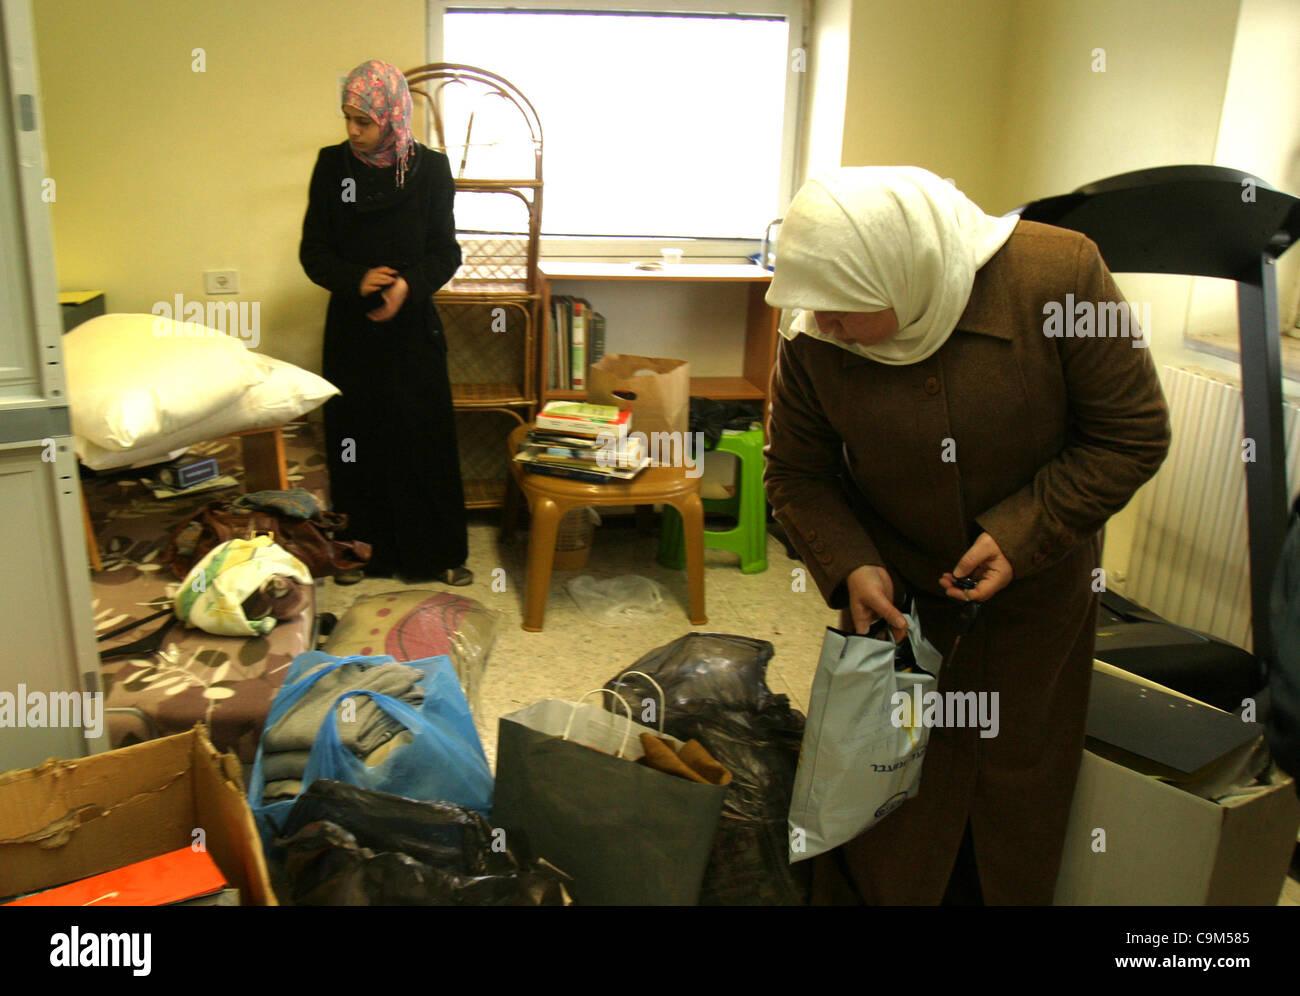 Jan. 1, 1980 - Jerusalem, Jerusalem, Palestinian Territory - Relatives of Palestinian Khaled abu Arafeh and Mohammed - Stock Image